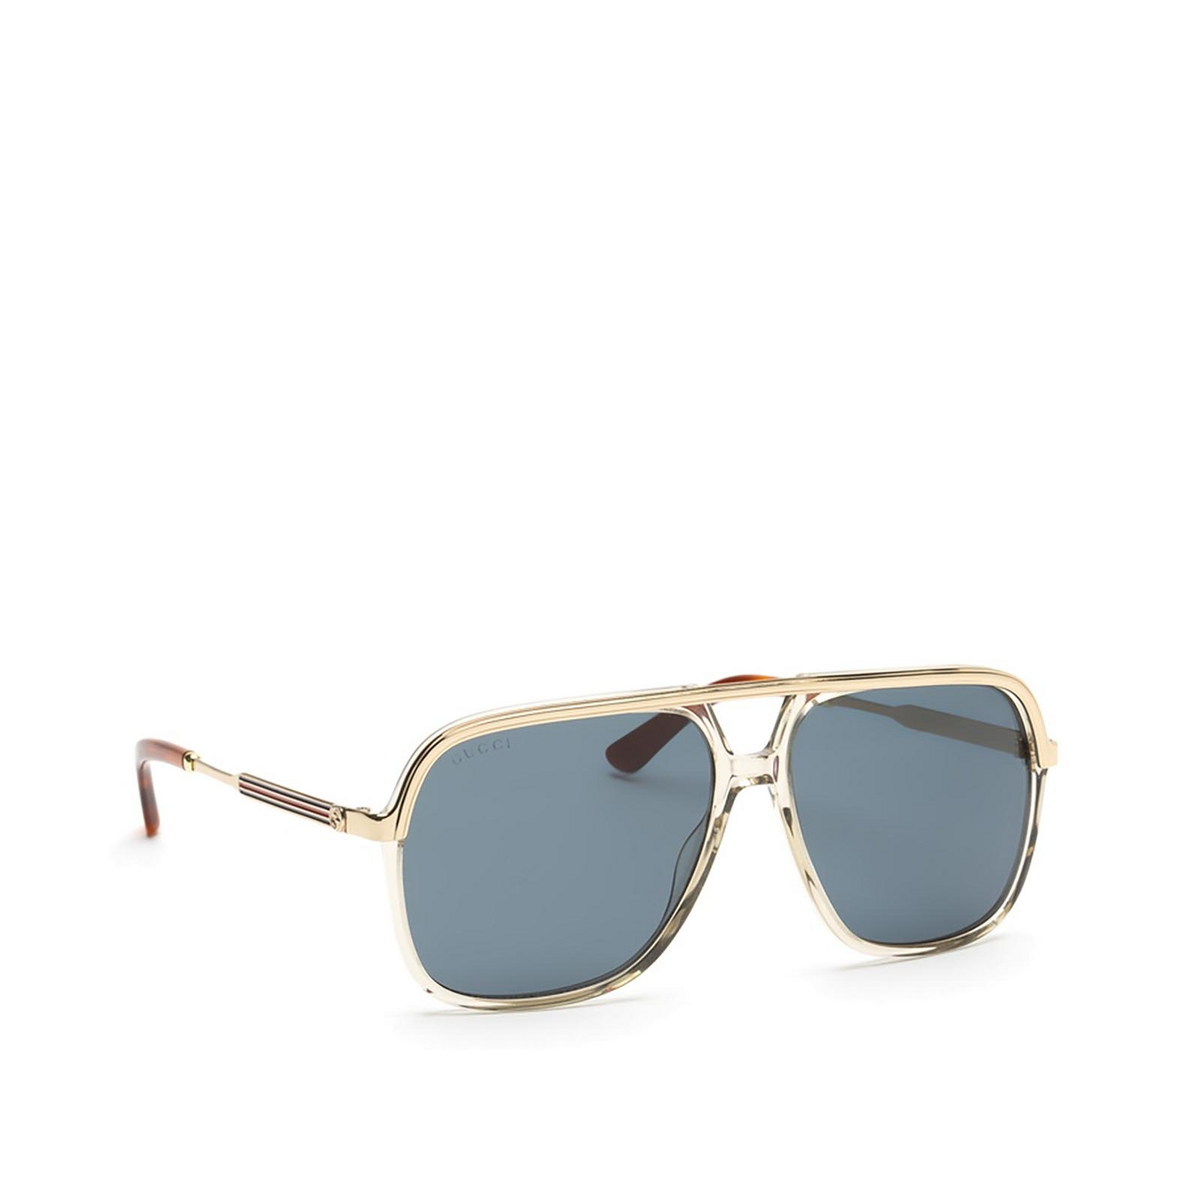 Gucci® Aviator Sunglasses: GG0200S color Transparent Brown 004 - 2/3.